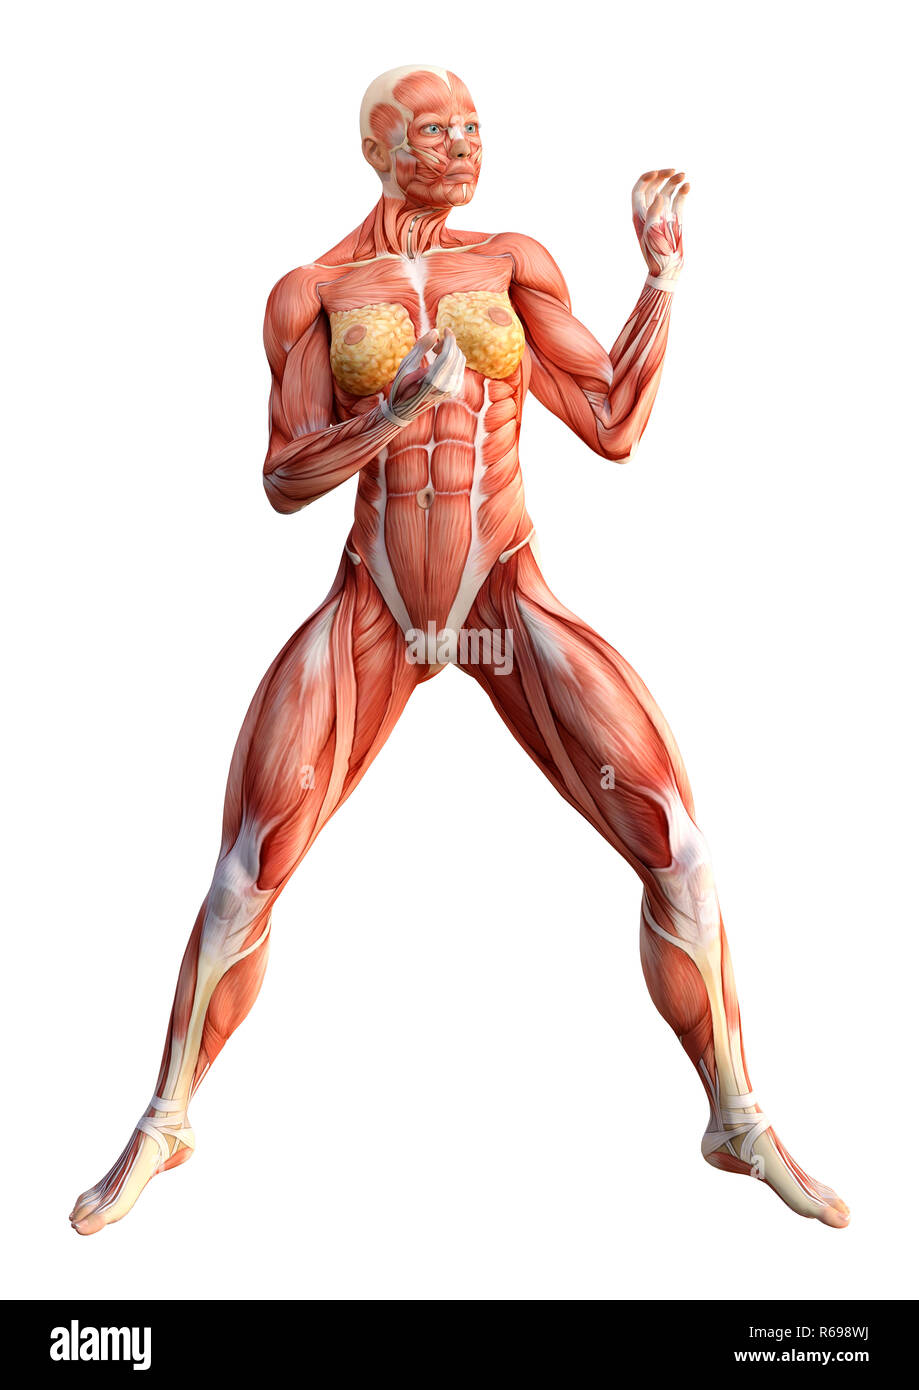 3d Rendering Female Anatomy Figure On White Stock Photo 227627278